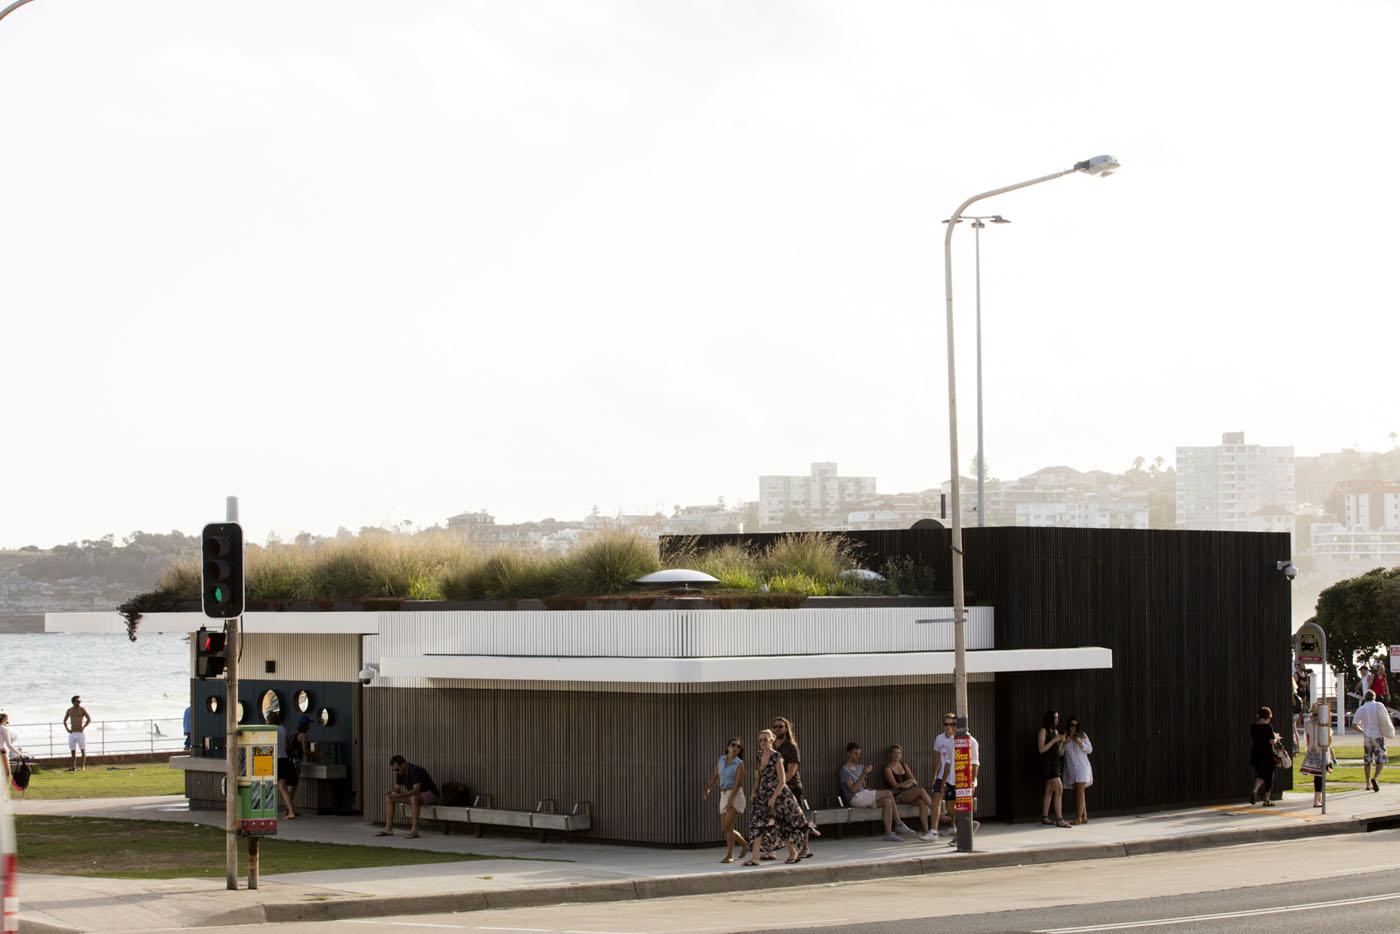 North Bondi Amenities, a public project by award winning Sam Crawford Architects. View of a beautiful toilet block.